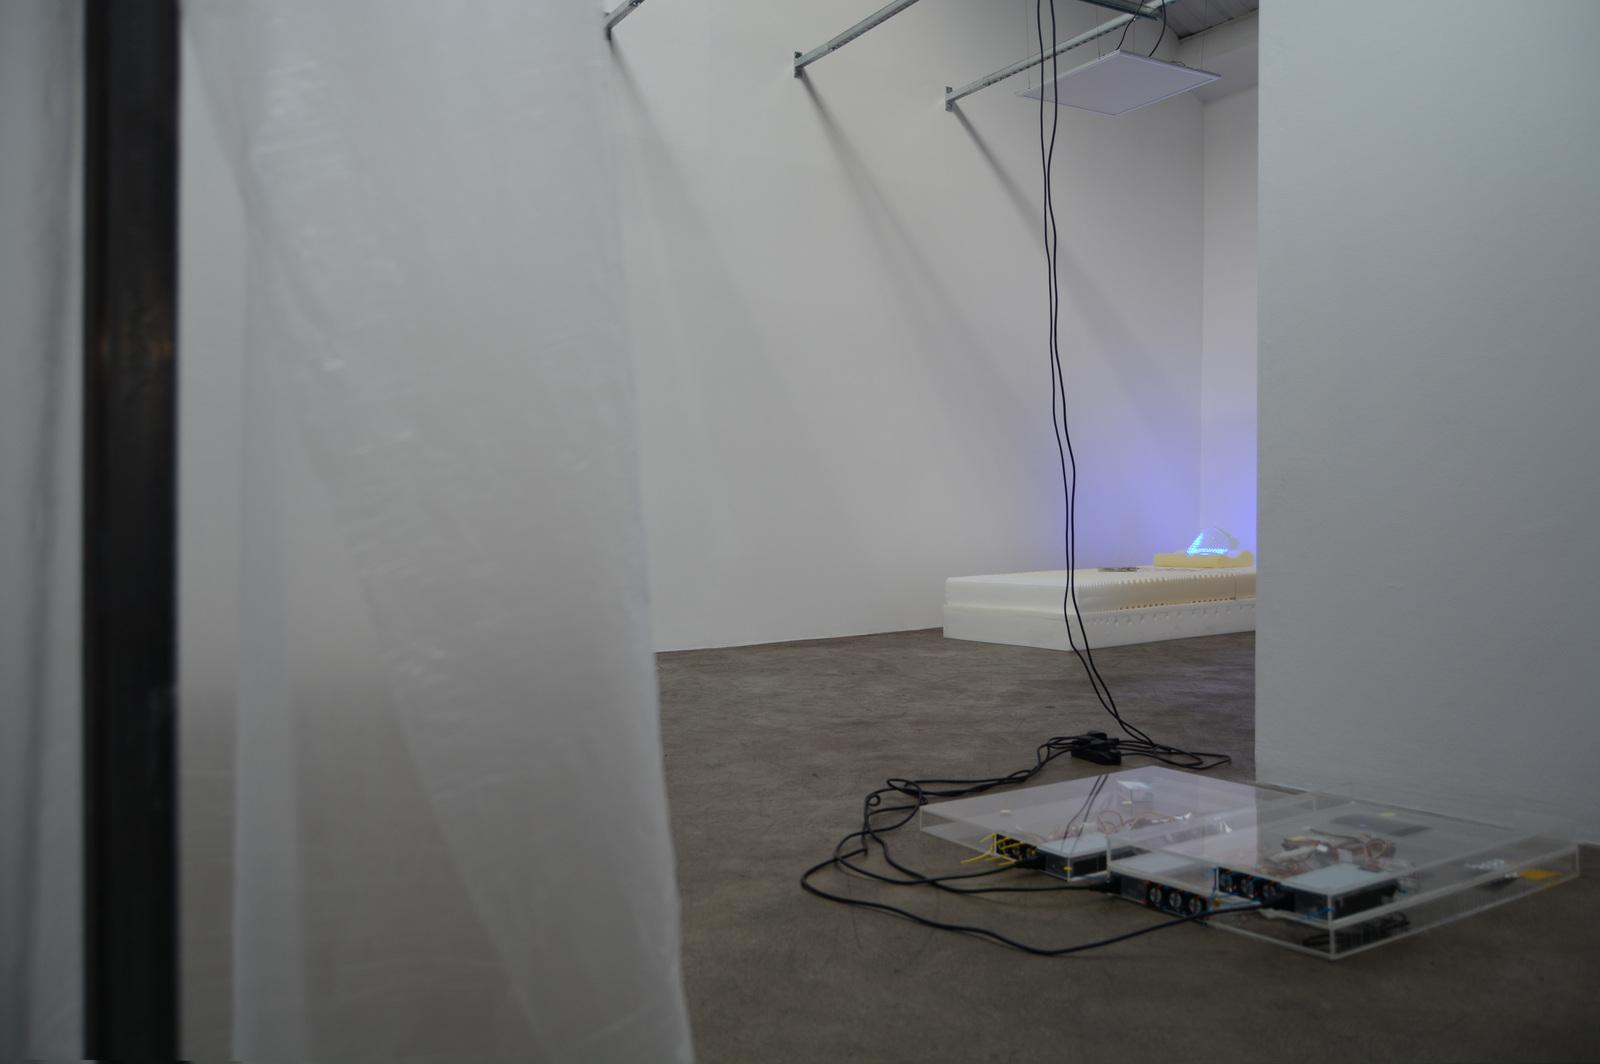 10. Yuri Pattison_sunset provision_installation view_memory foam remembers_dust,scraper, fan